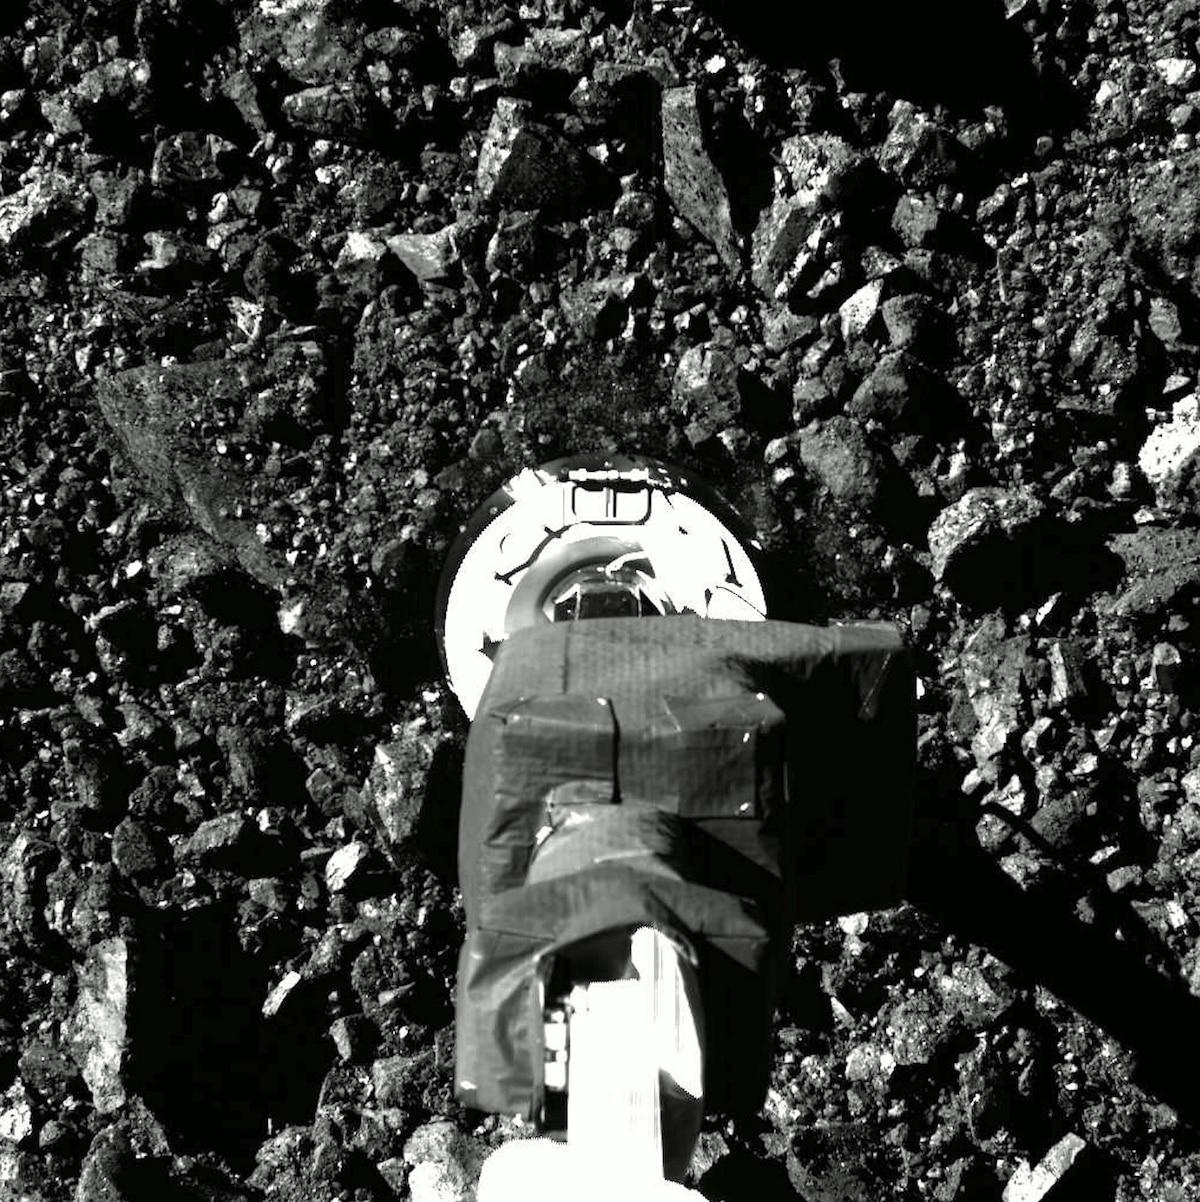 NASA's OSIRIS-REx secures asteroid sample after surprise leak